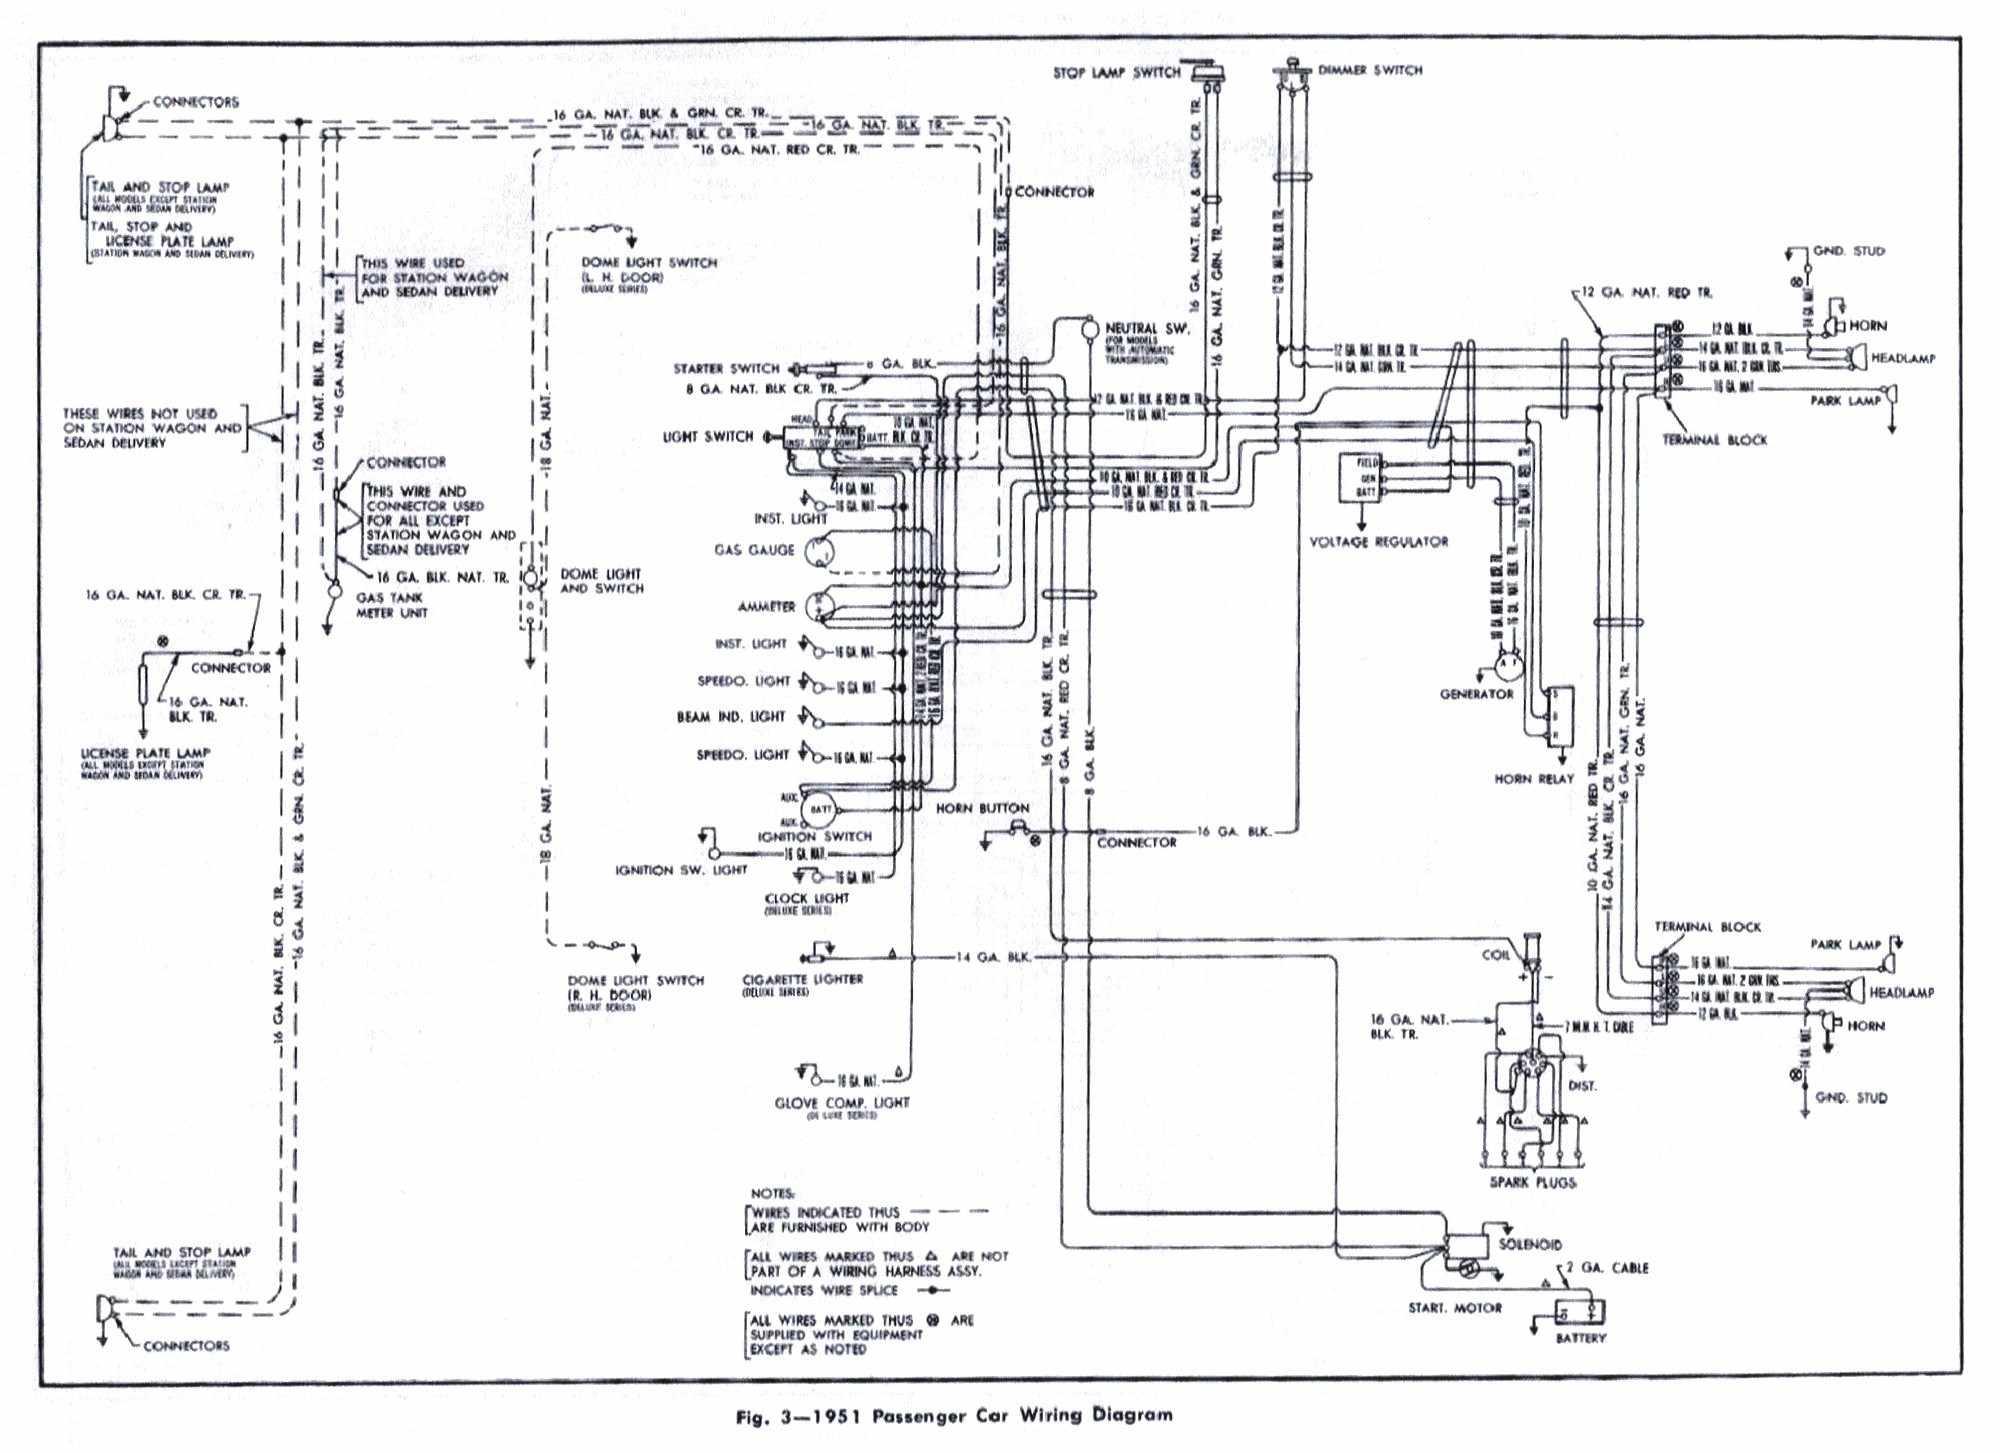 wiring diagram 1969 oldsmobile 442